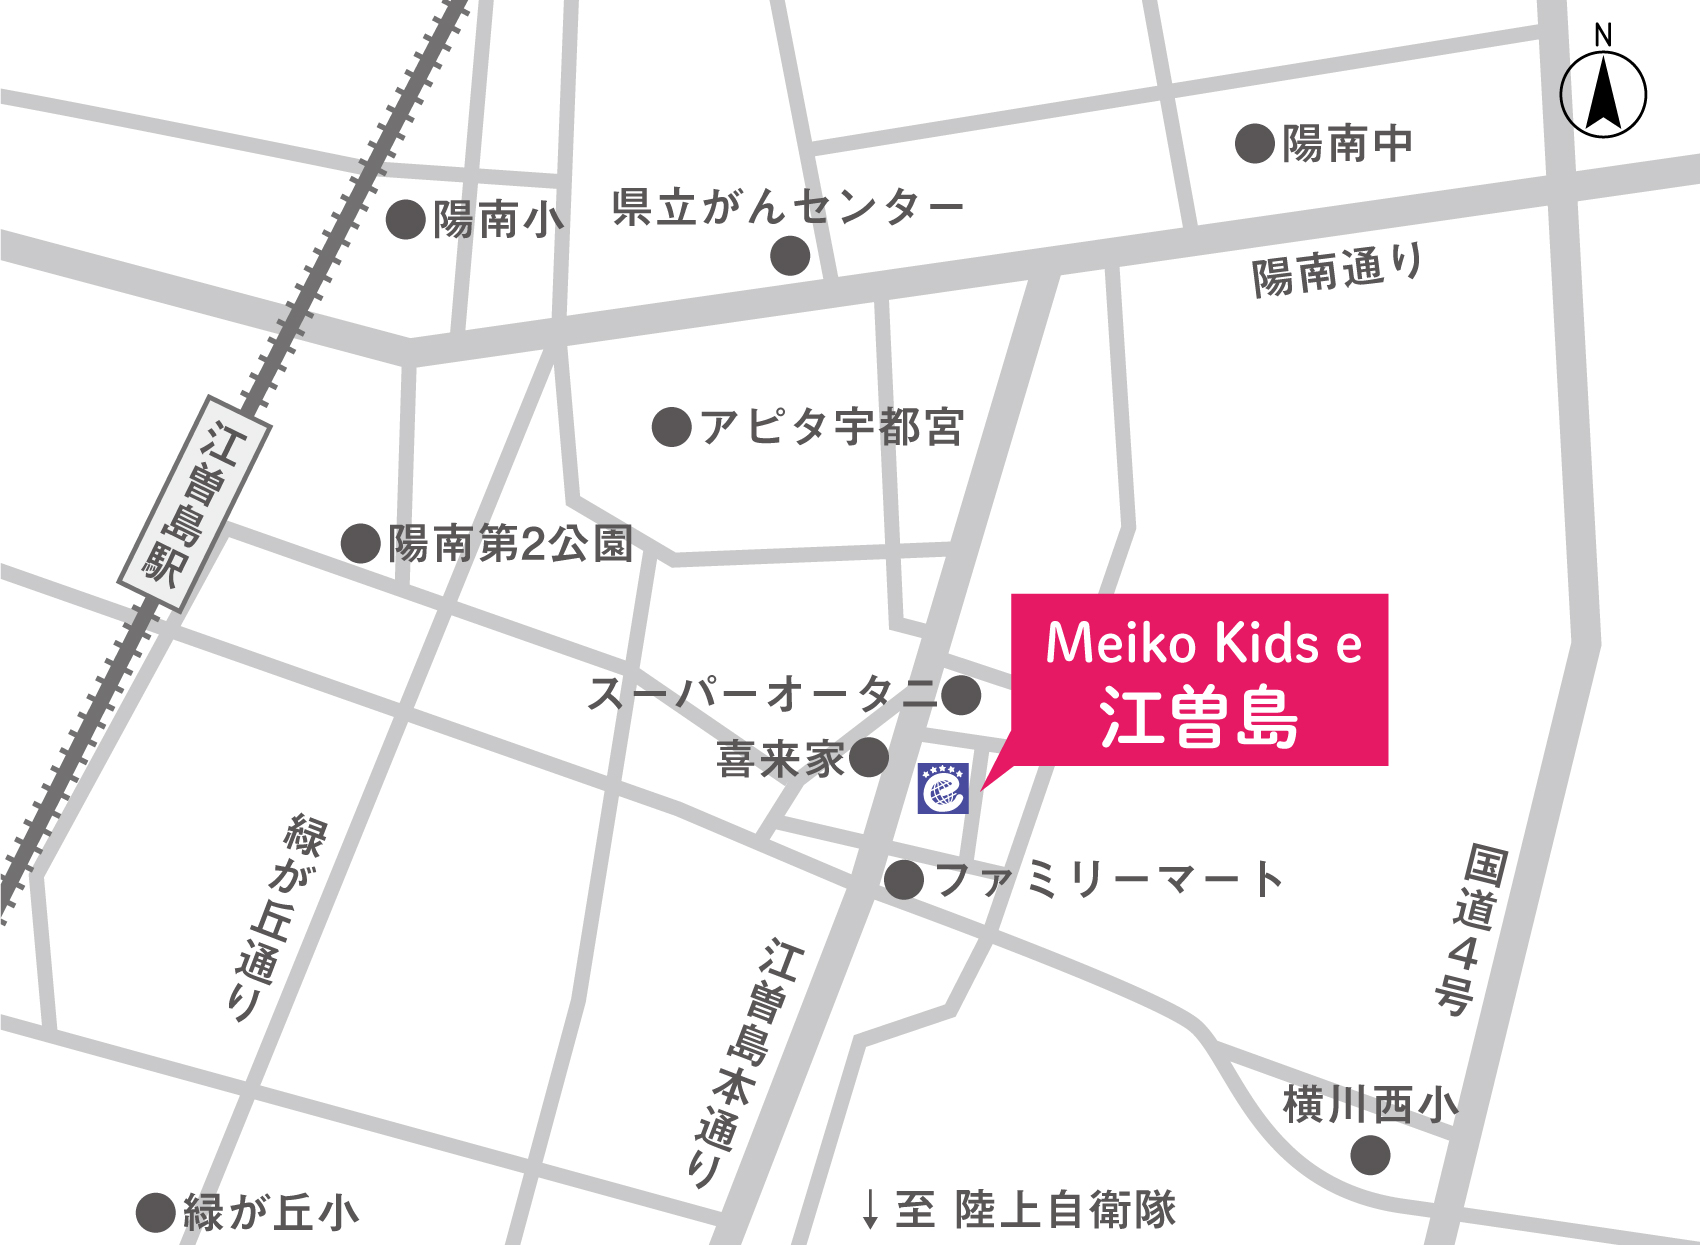 Meiko Kids e 江曽島